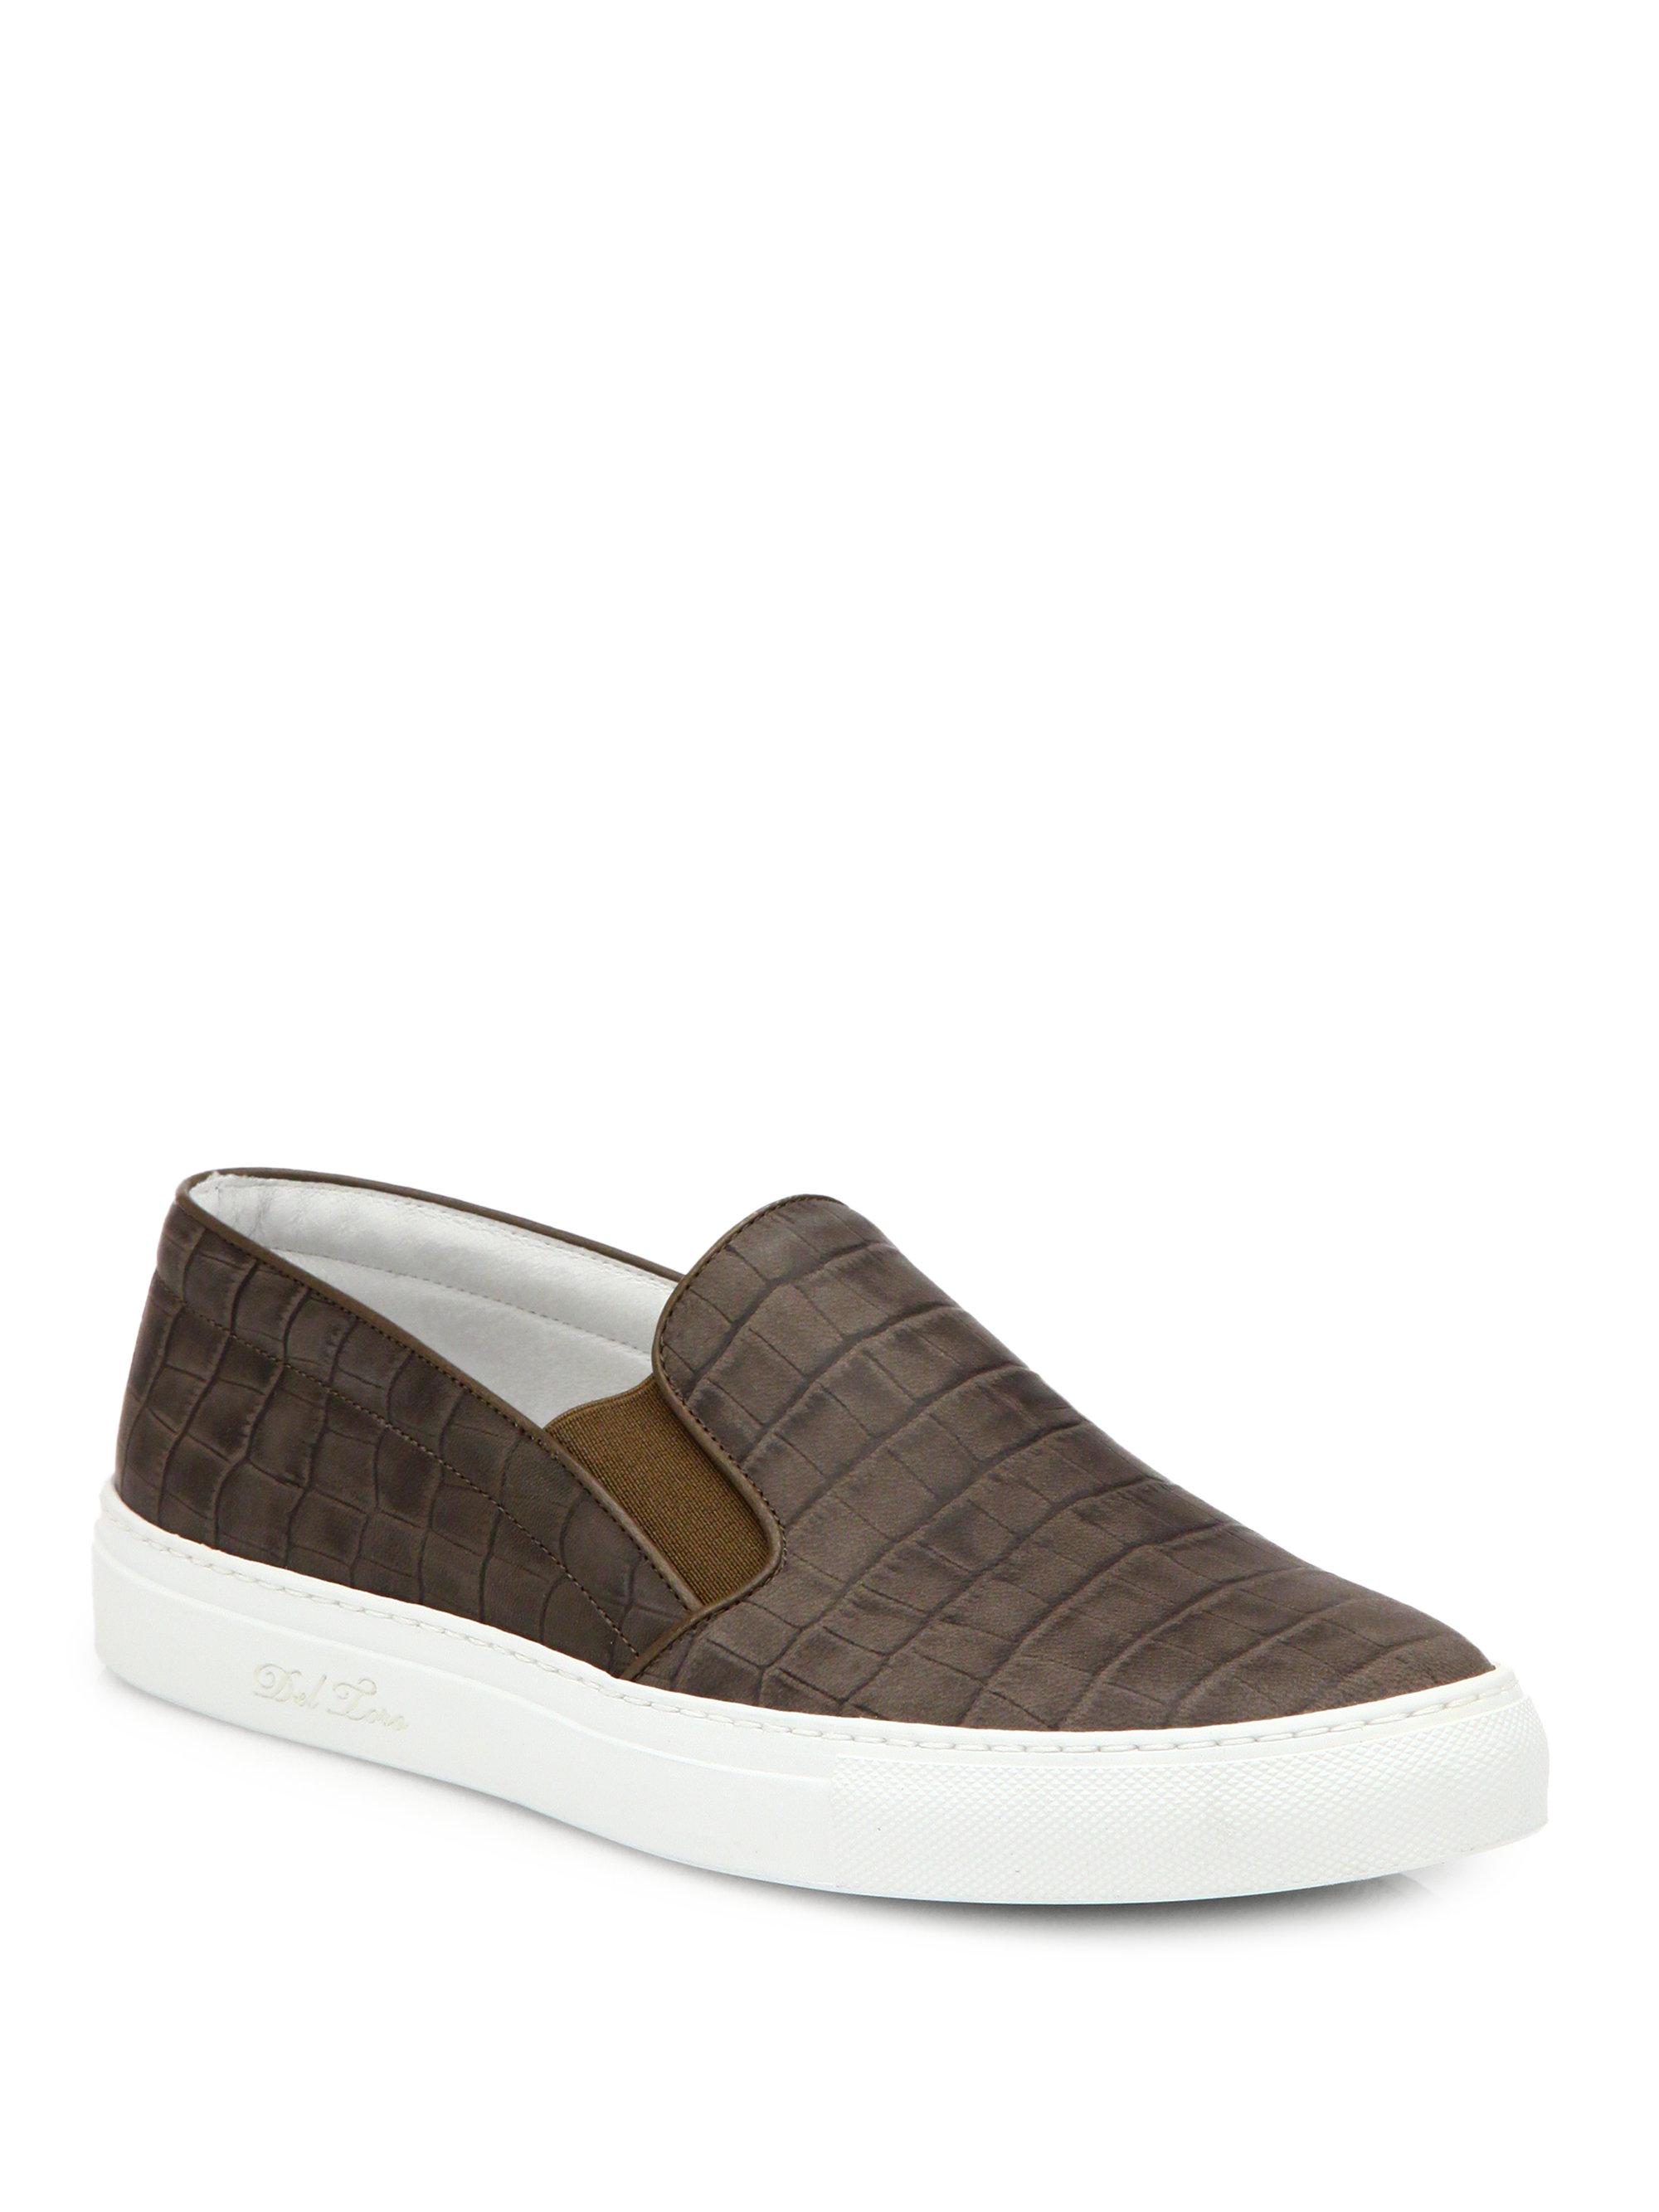 Brown Leather Faux Croc Shoes